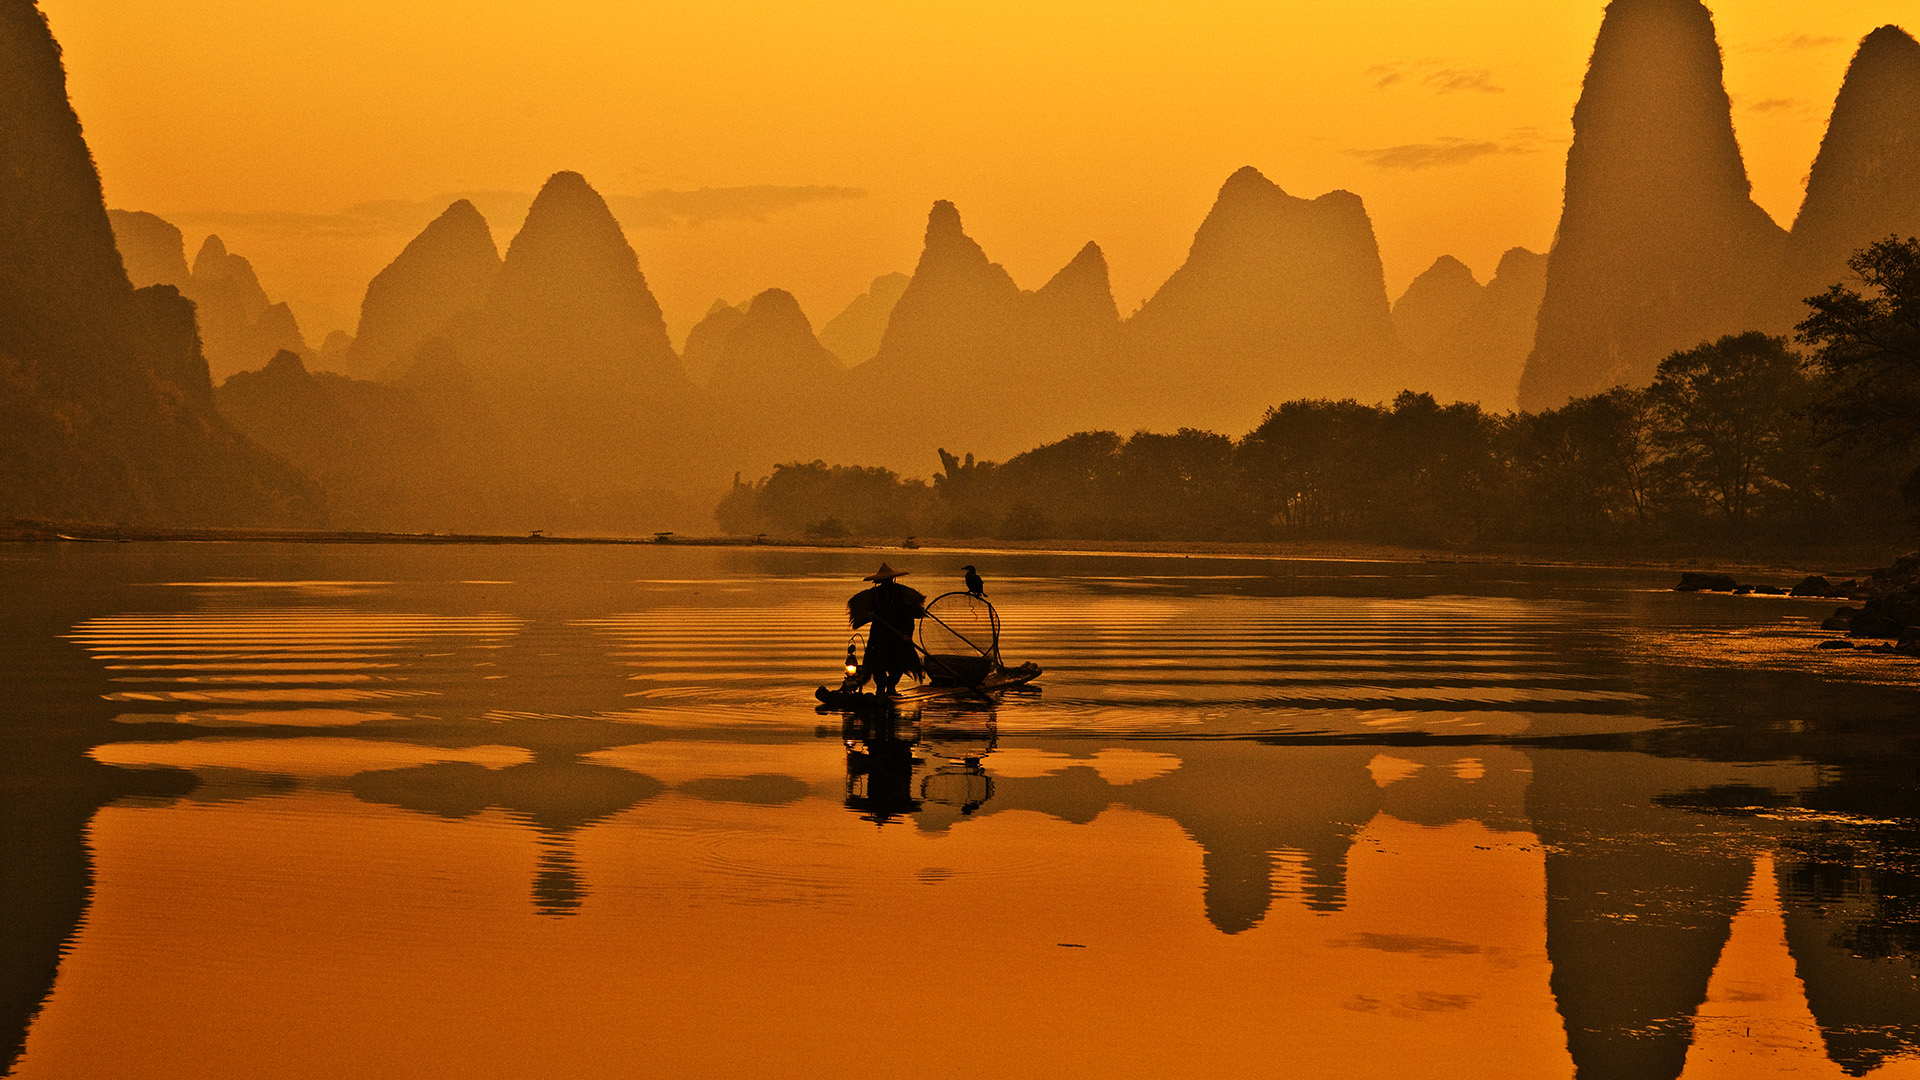 China contributes to international standards for karst landscapes